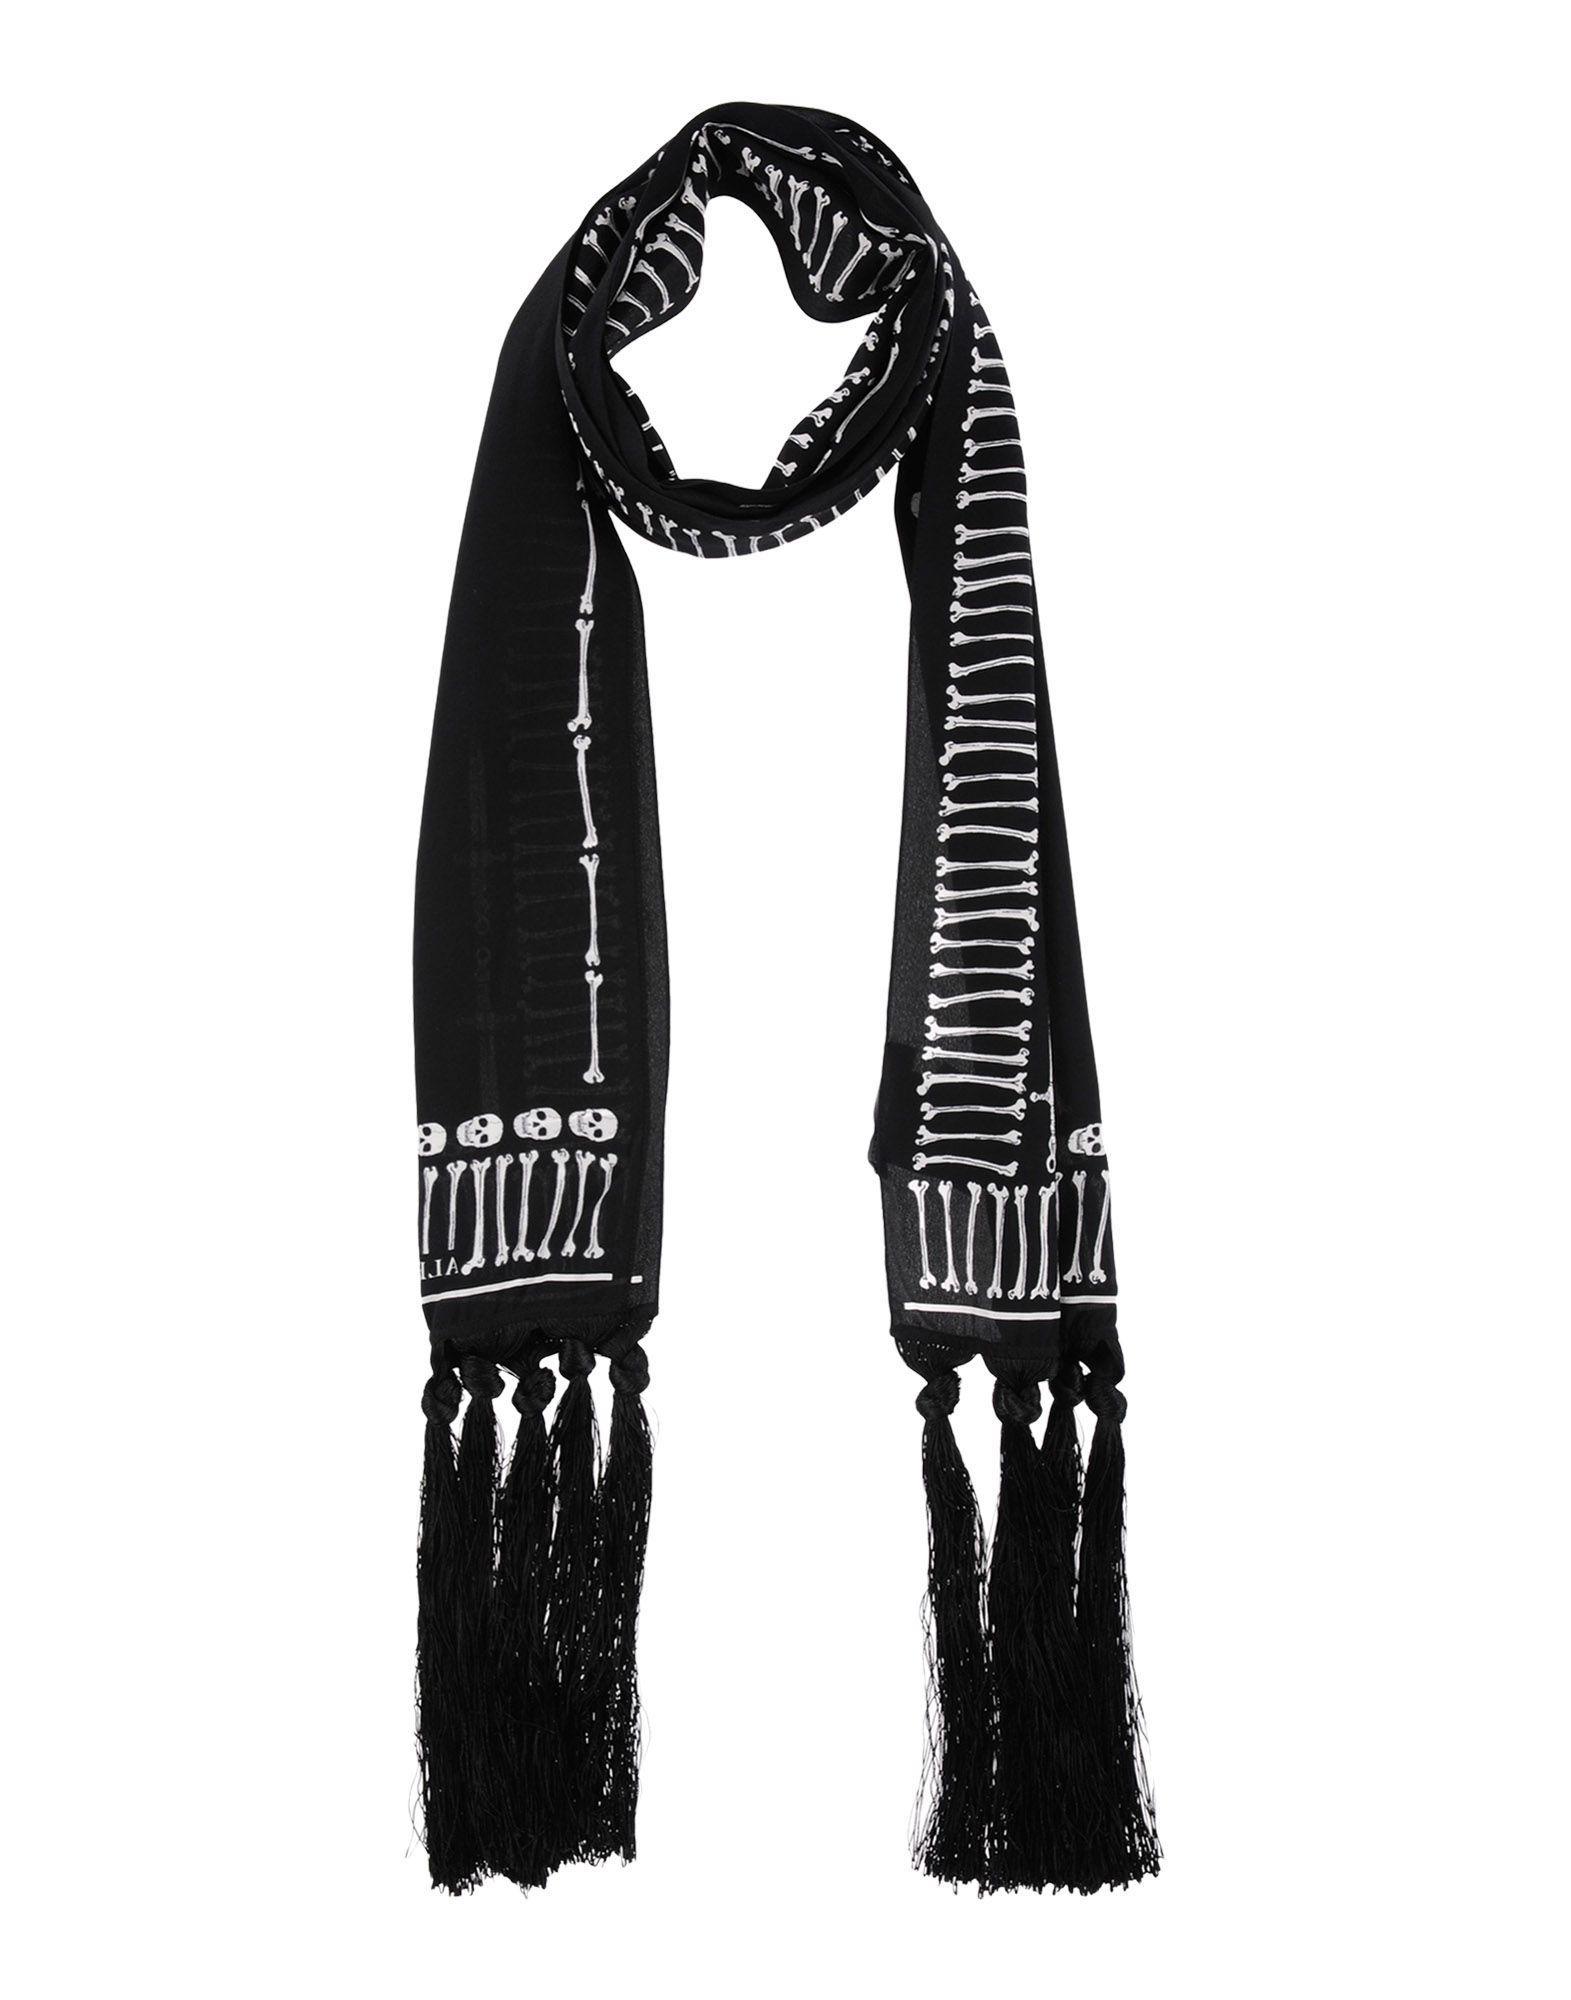 Alexander Mcqueen Oblong Scarves In Black